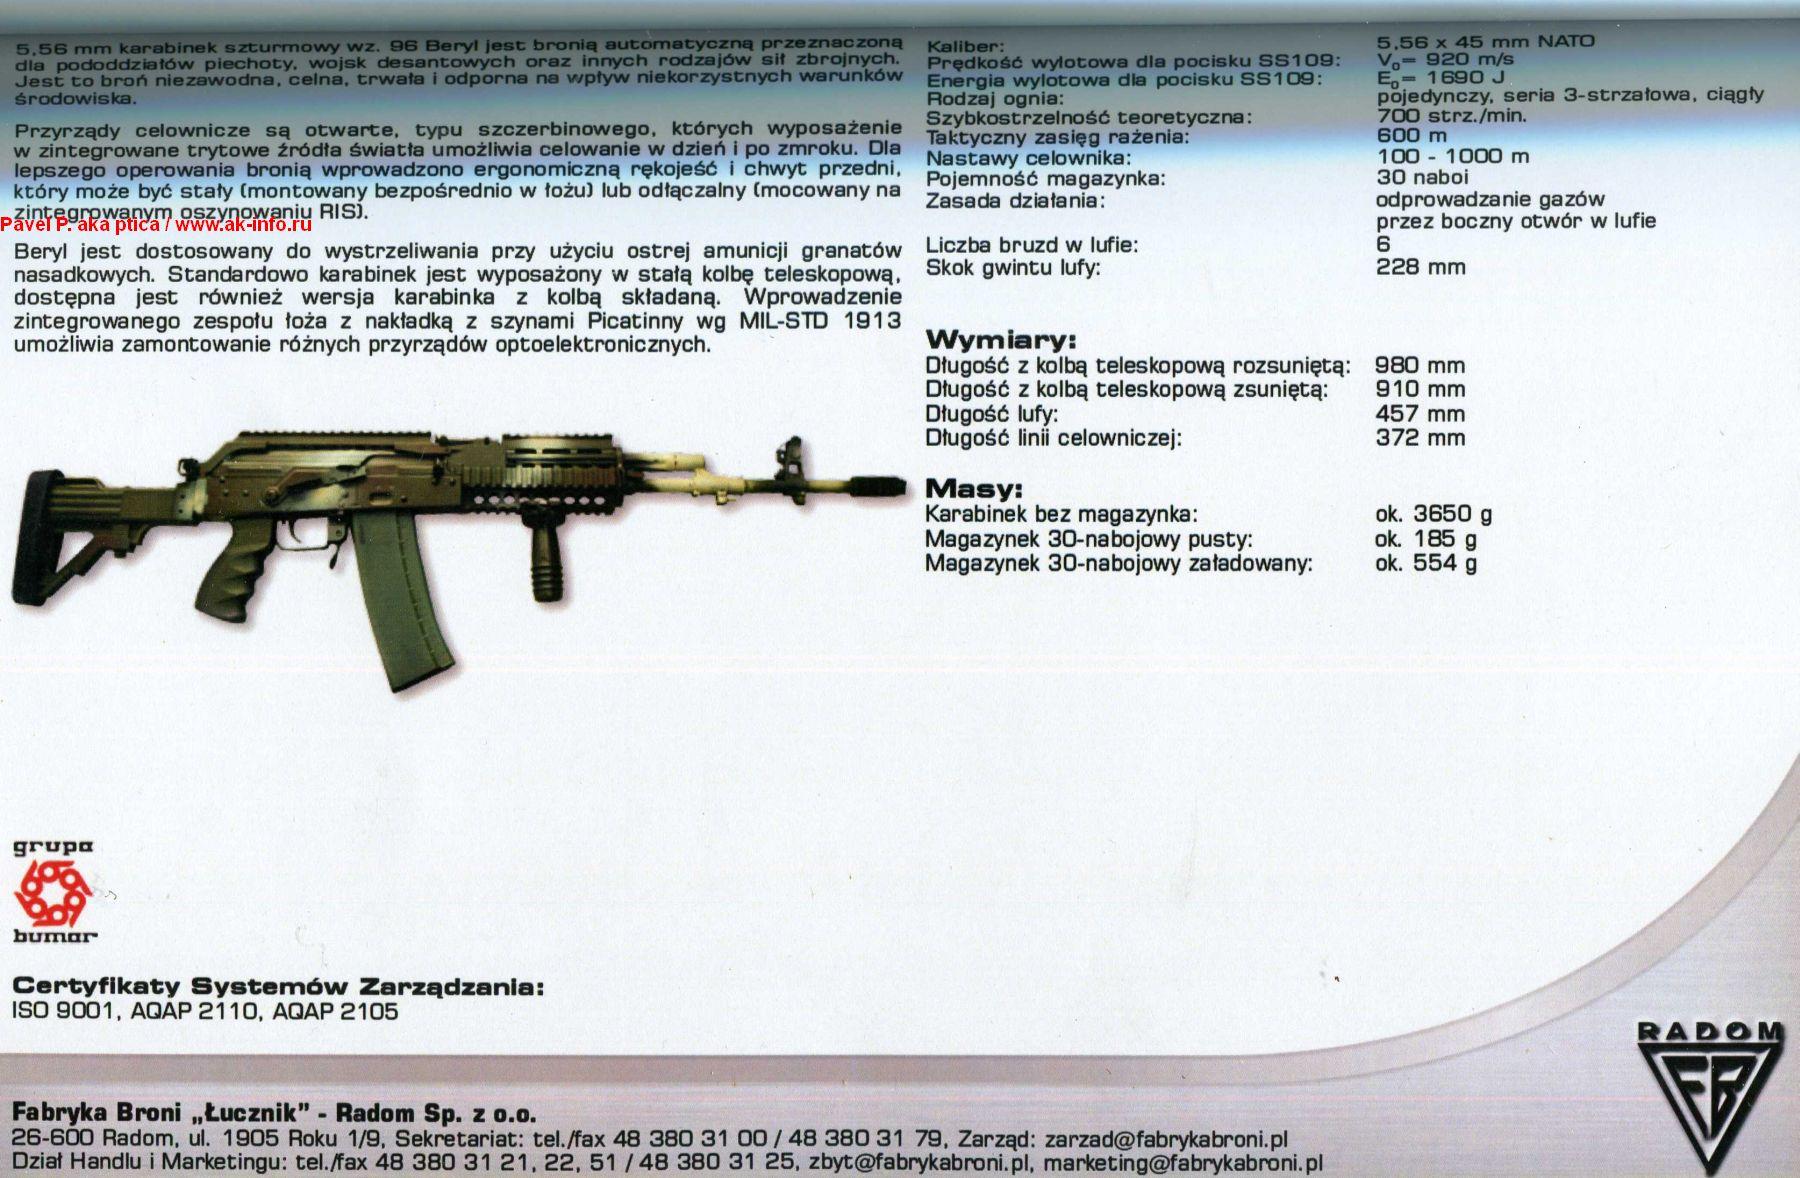 5.56 mm karabin szturmowy wz. 96